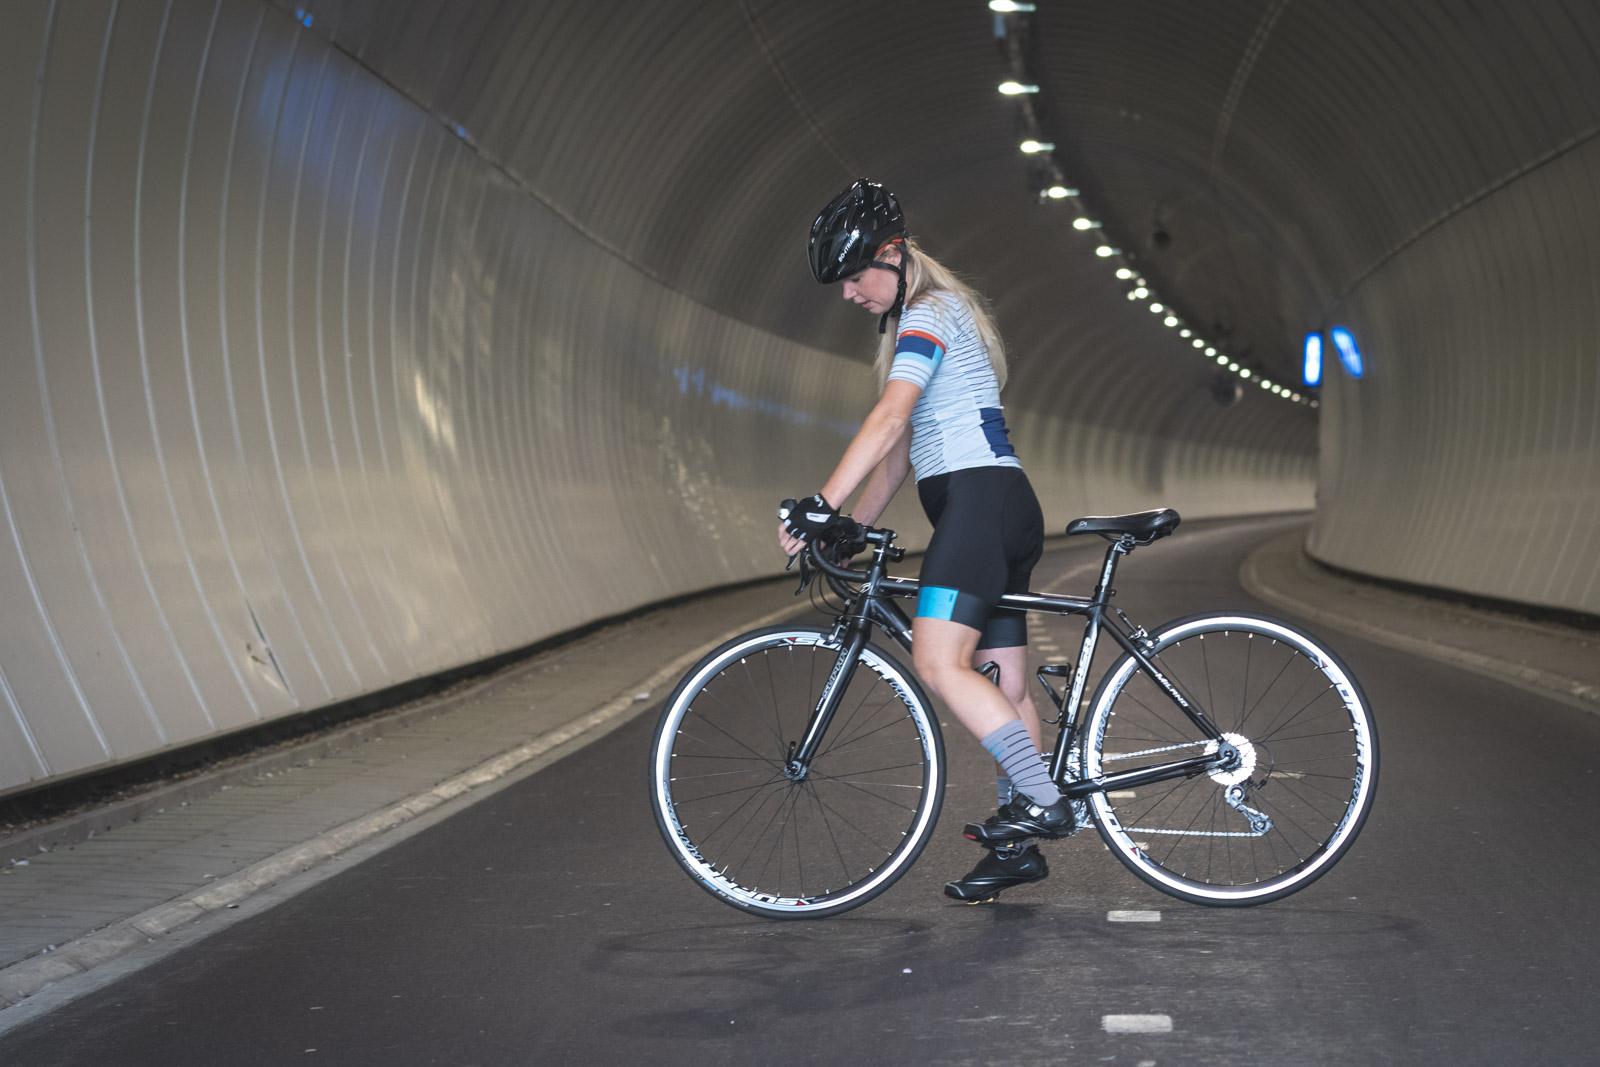 OrNot fietskleding lifebehindbarsnl 100